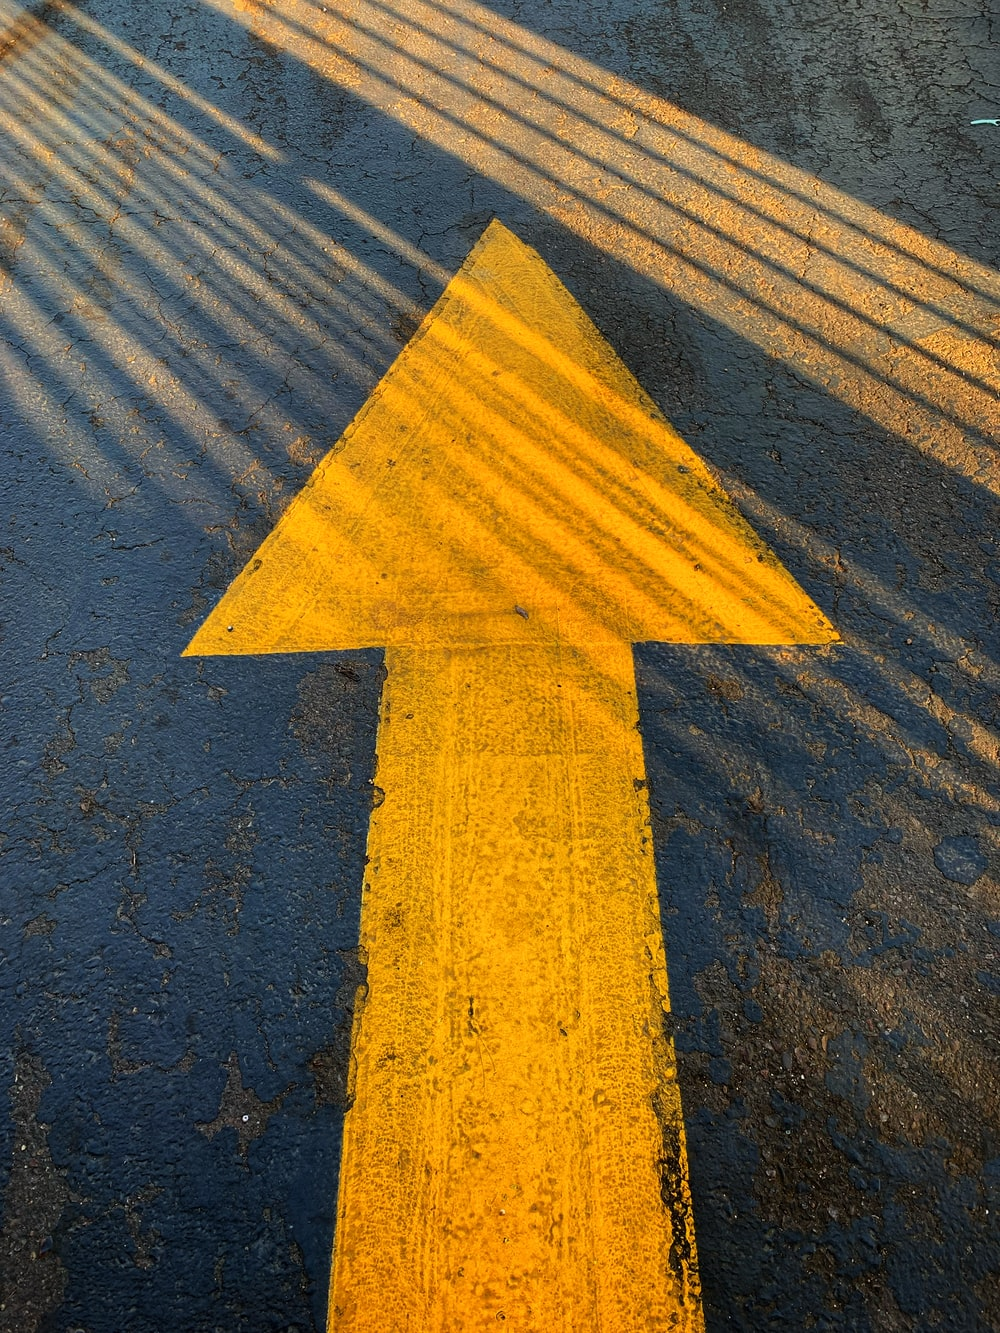 yellow arrow sign on gray concrete road